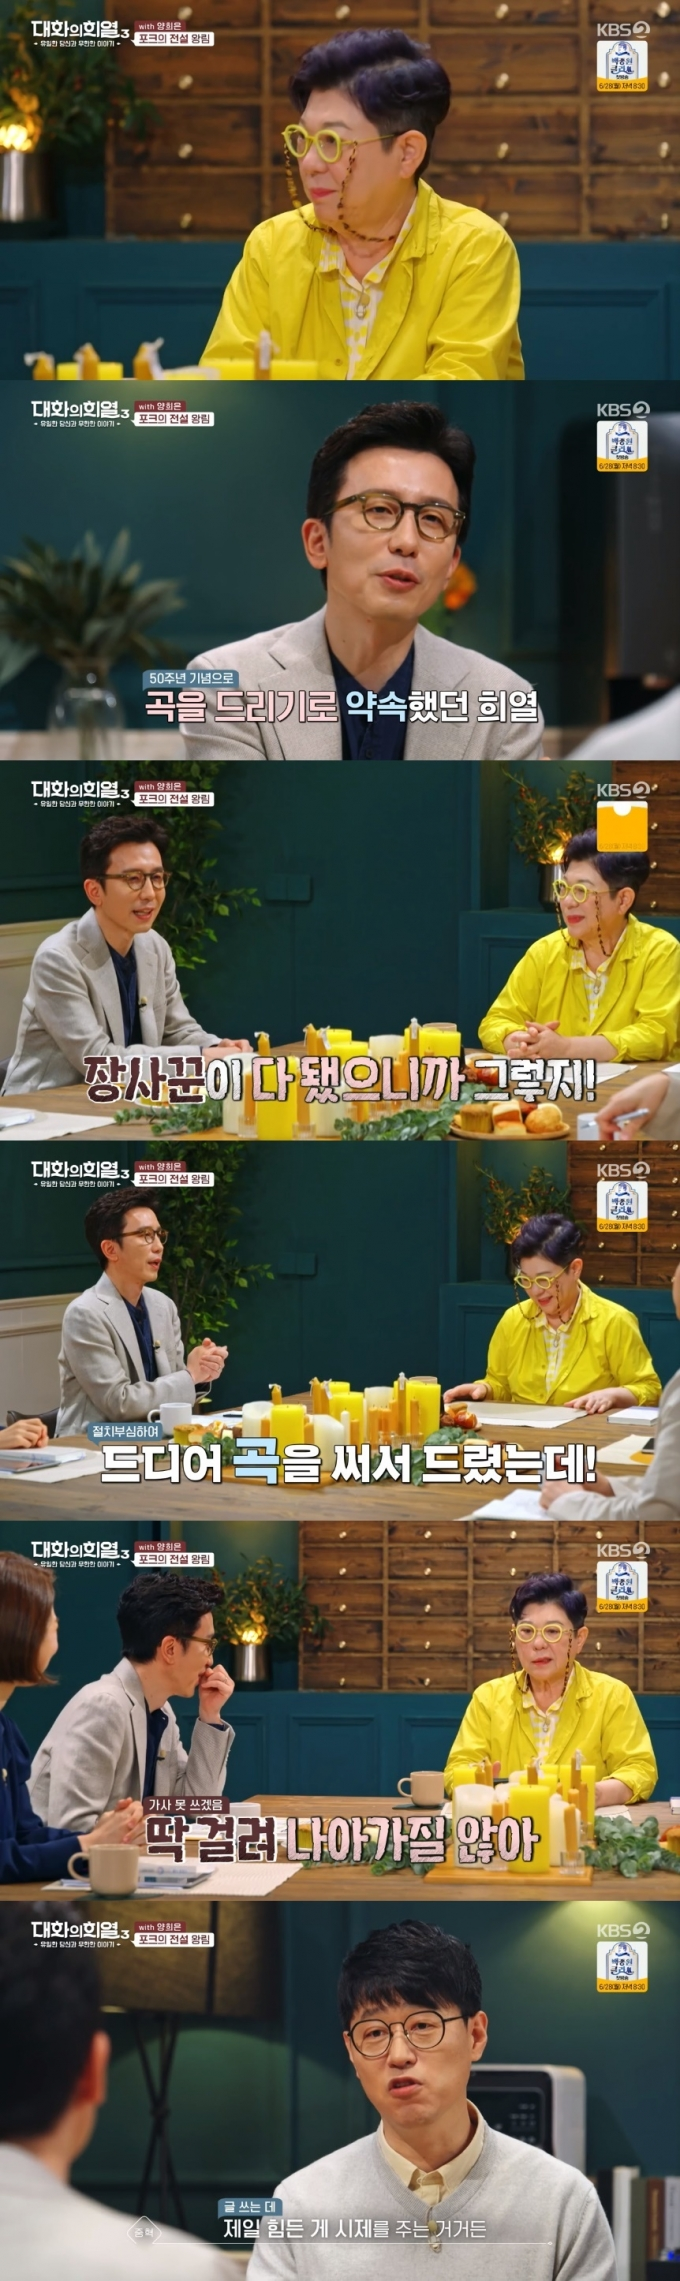 KBS 2TV '대화의 희열 3' 캡처 © 뉴스1